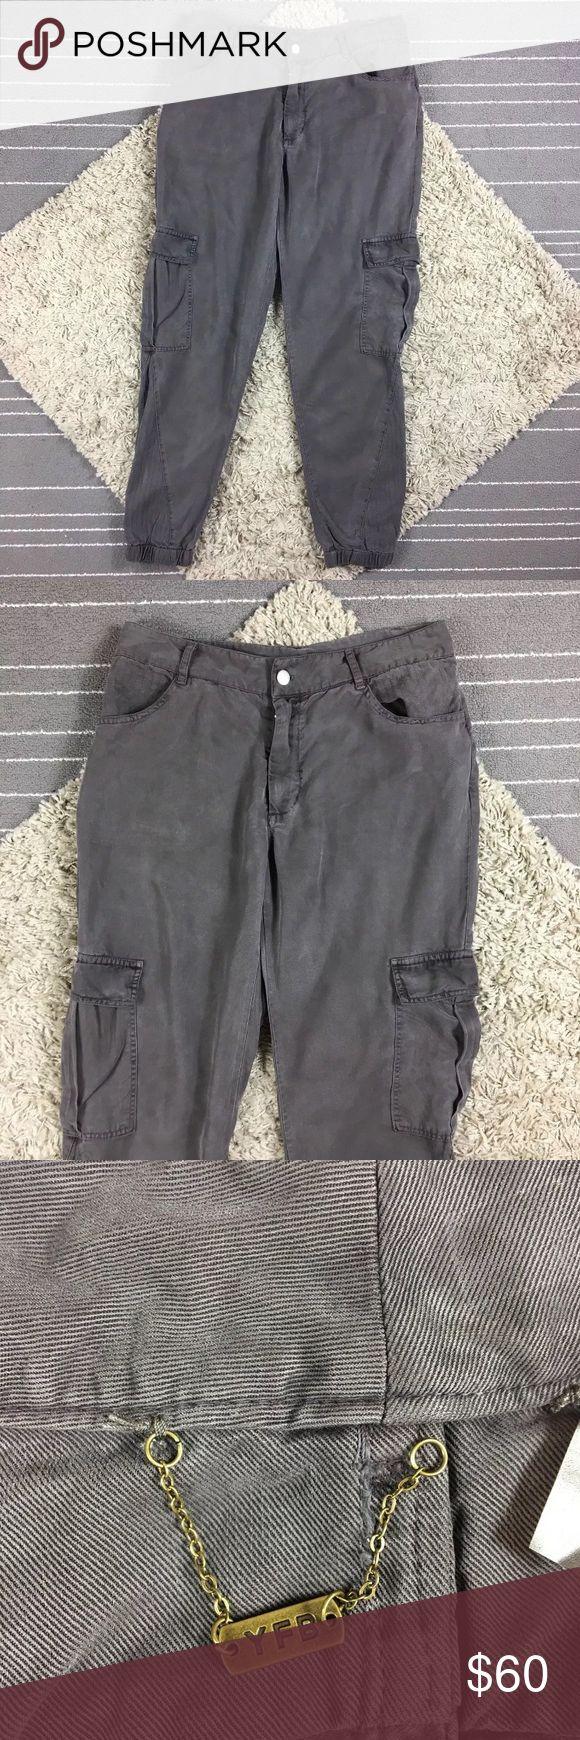 "YFB Cargo Pants Brown Joggers Size Medium 100% tencel, waist 15.5"", rise 9.5"", inseam 27.5"" Young Fabulous & Broke Pants Track Pants & Joggers"